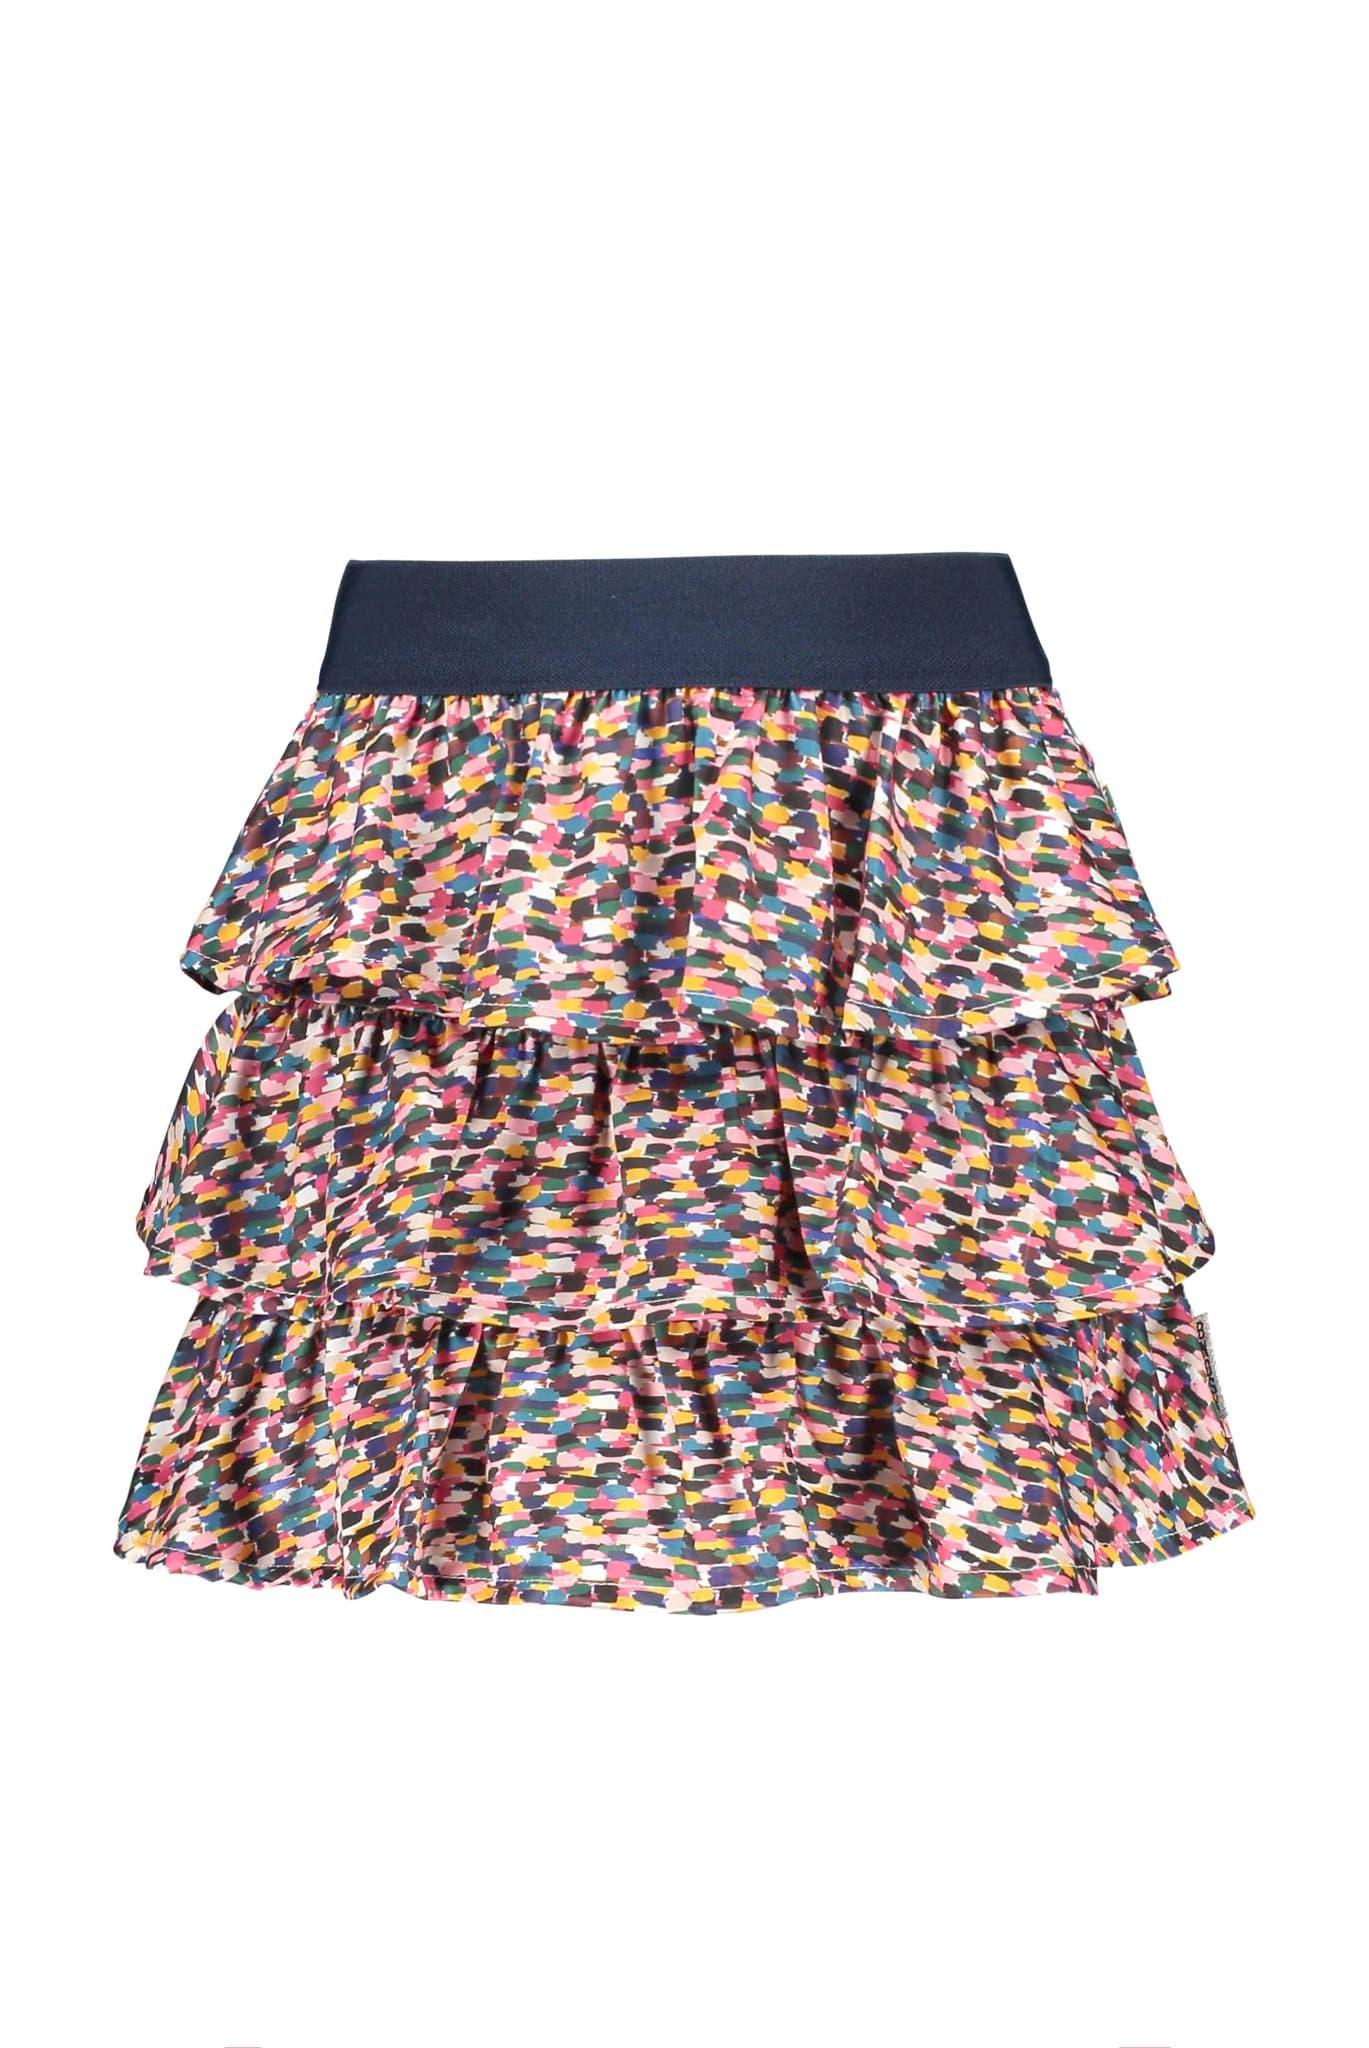 B.Nosy Sporty Skirt